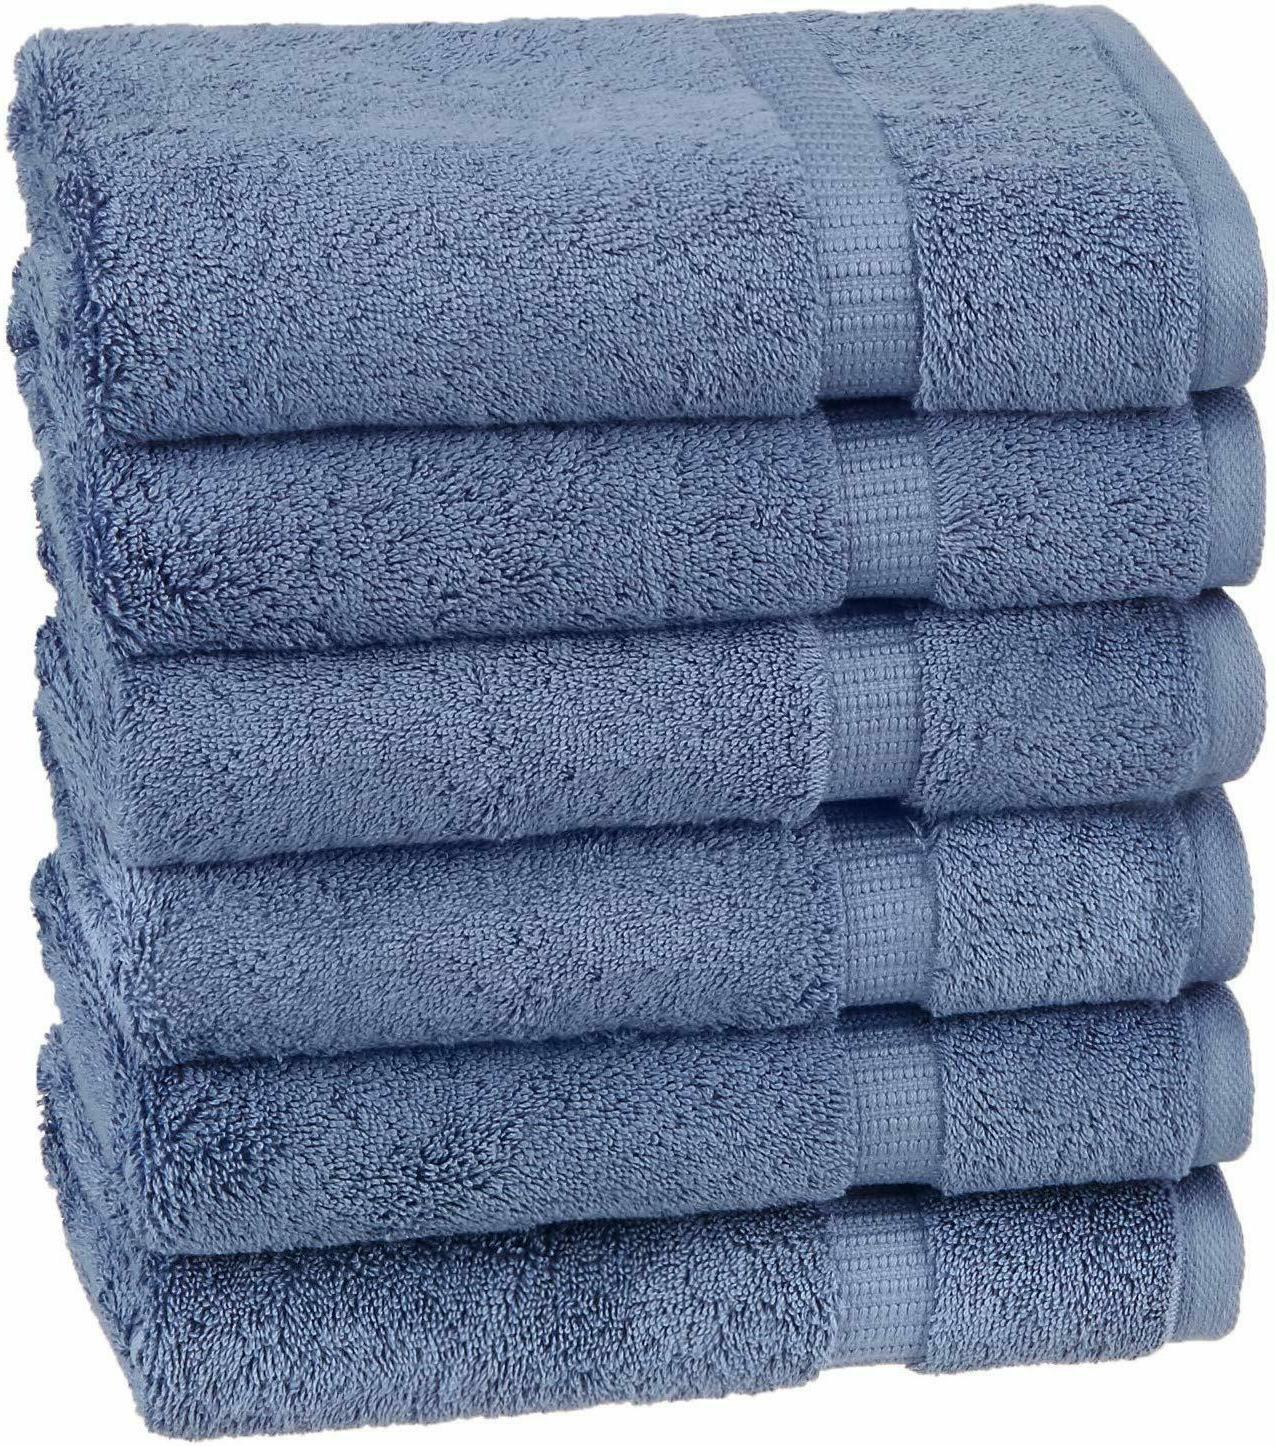 luxurious soft organic cotton hand towels set